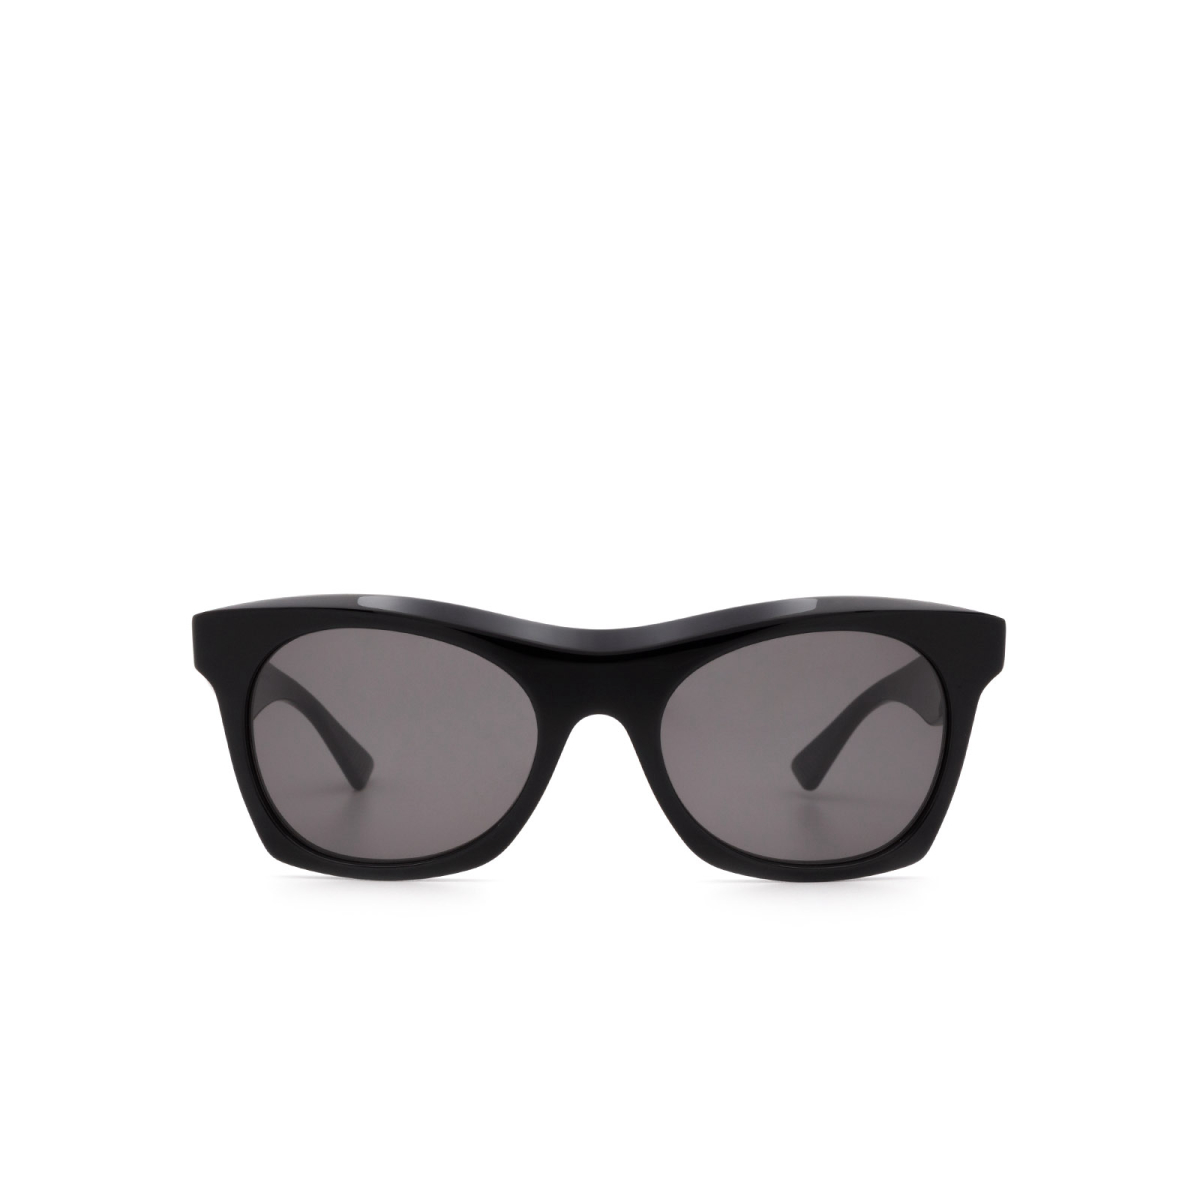 Bottega Veneta® Square Sunglasses: BV1061S color Black 001.